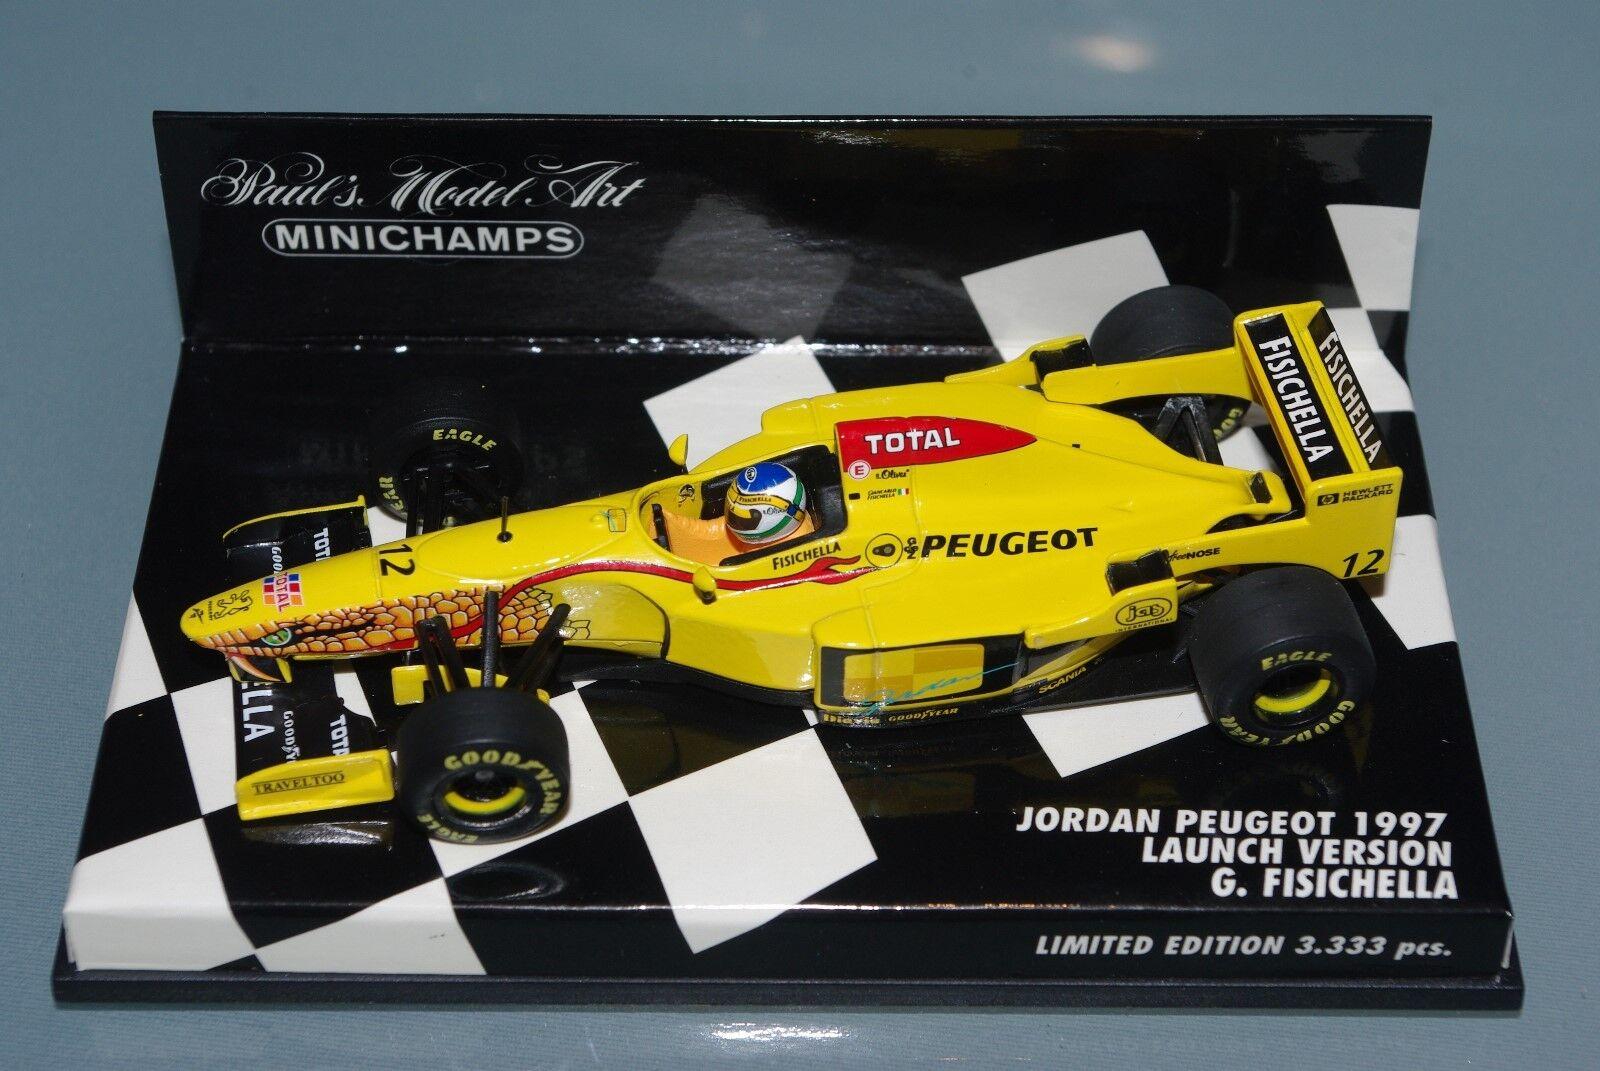 Minichamps F1 1 43 Jordan Peugeot 1997 lanzamiento Versión-Giancarlo Ferrari